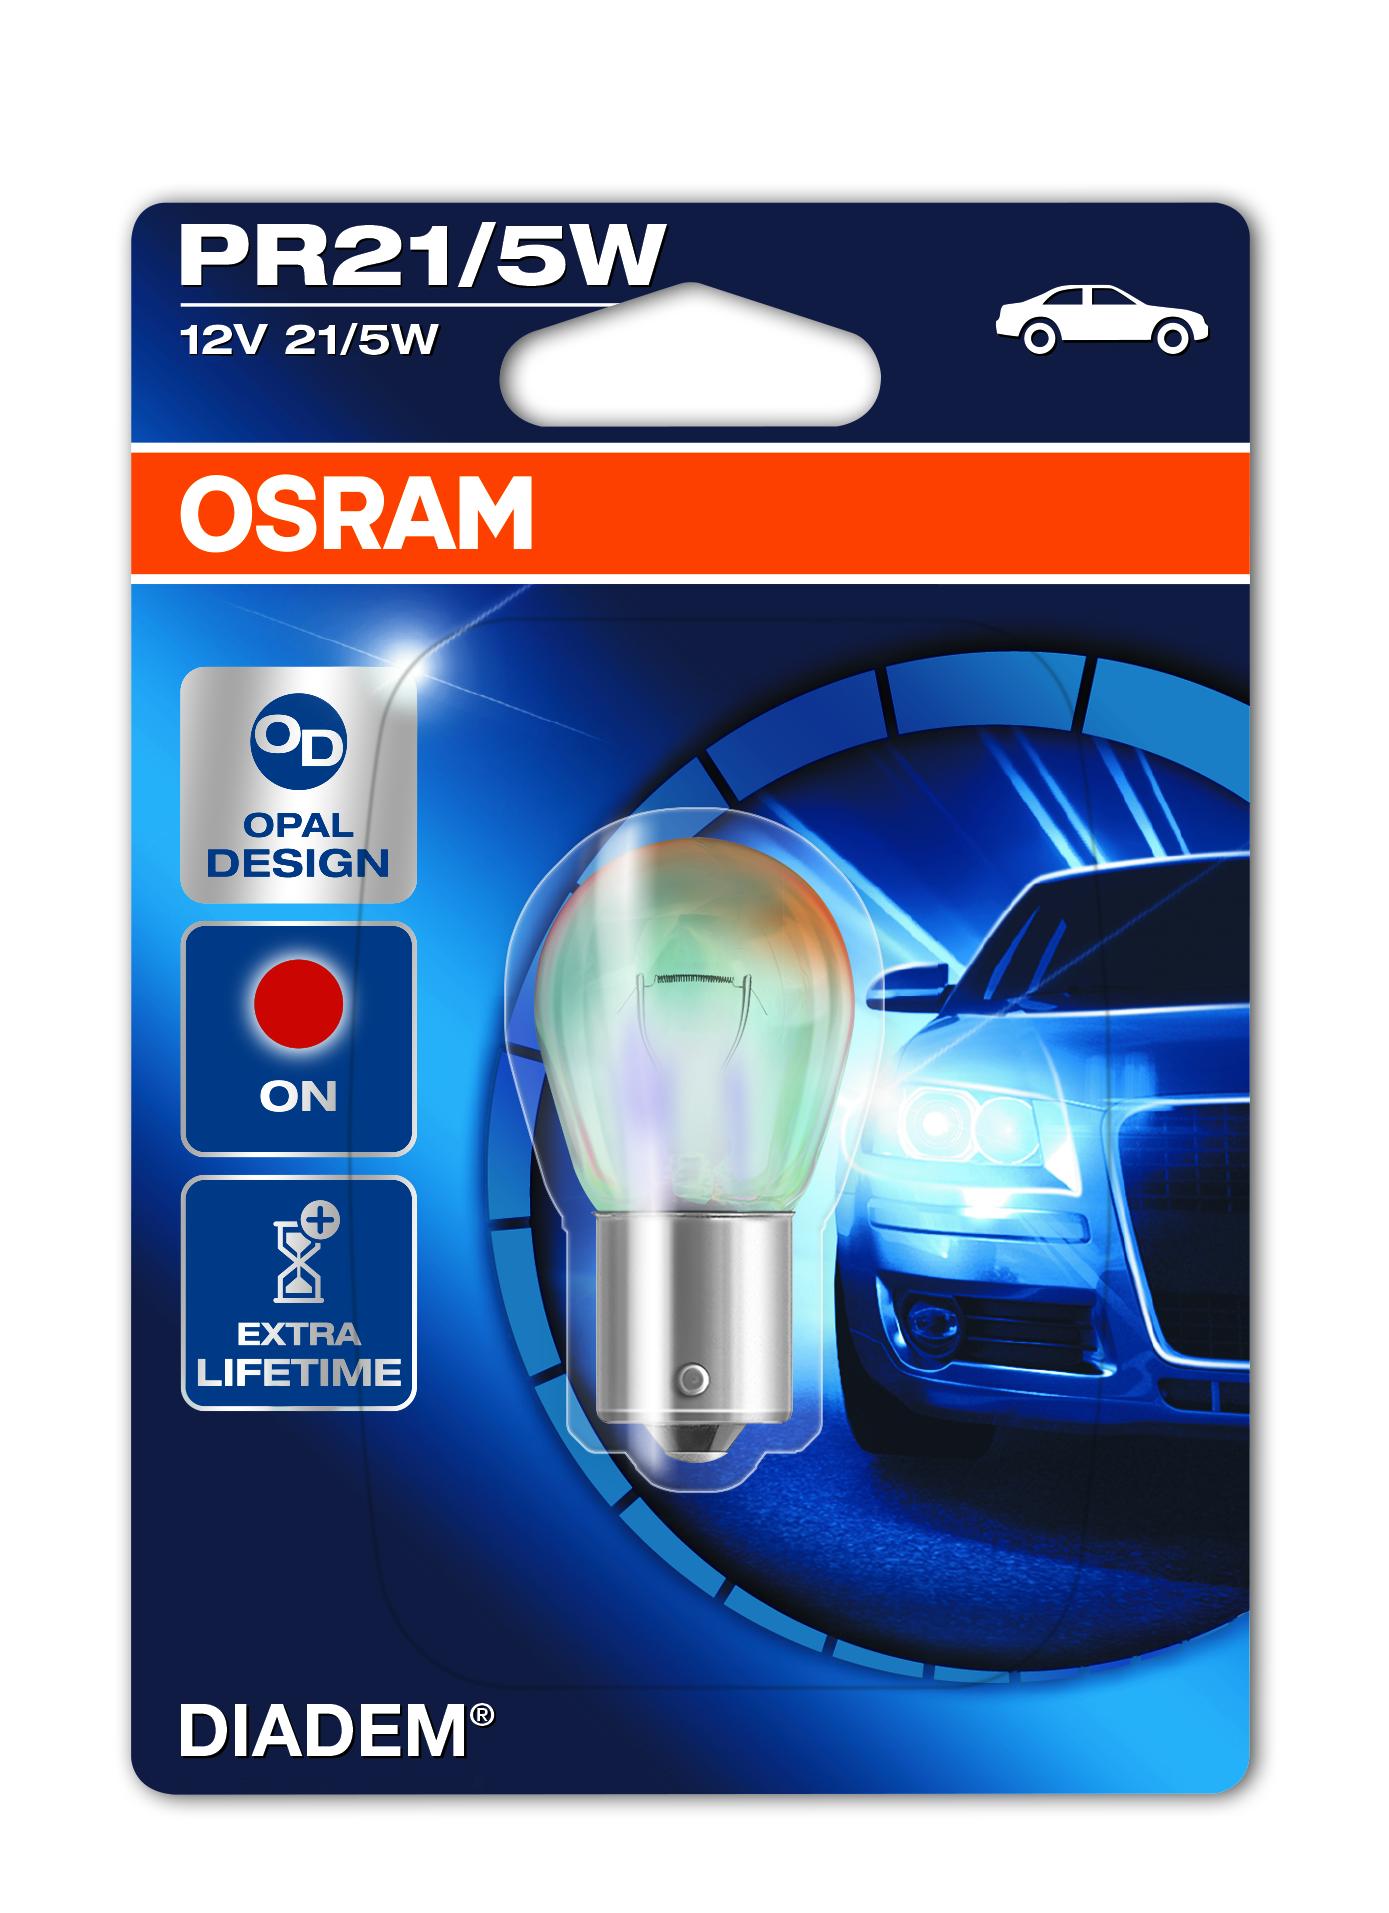 Osram halogenová žárovka, DIADEM, PR21/5W, BAW15d, 12V, 21/5W, 7538LDR-01B